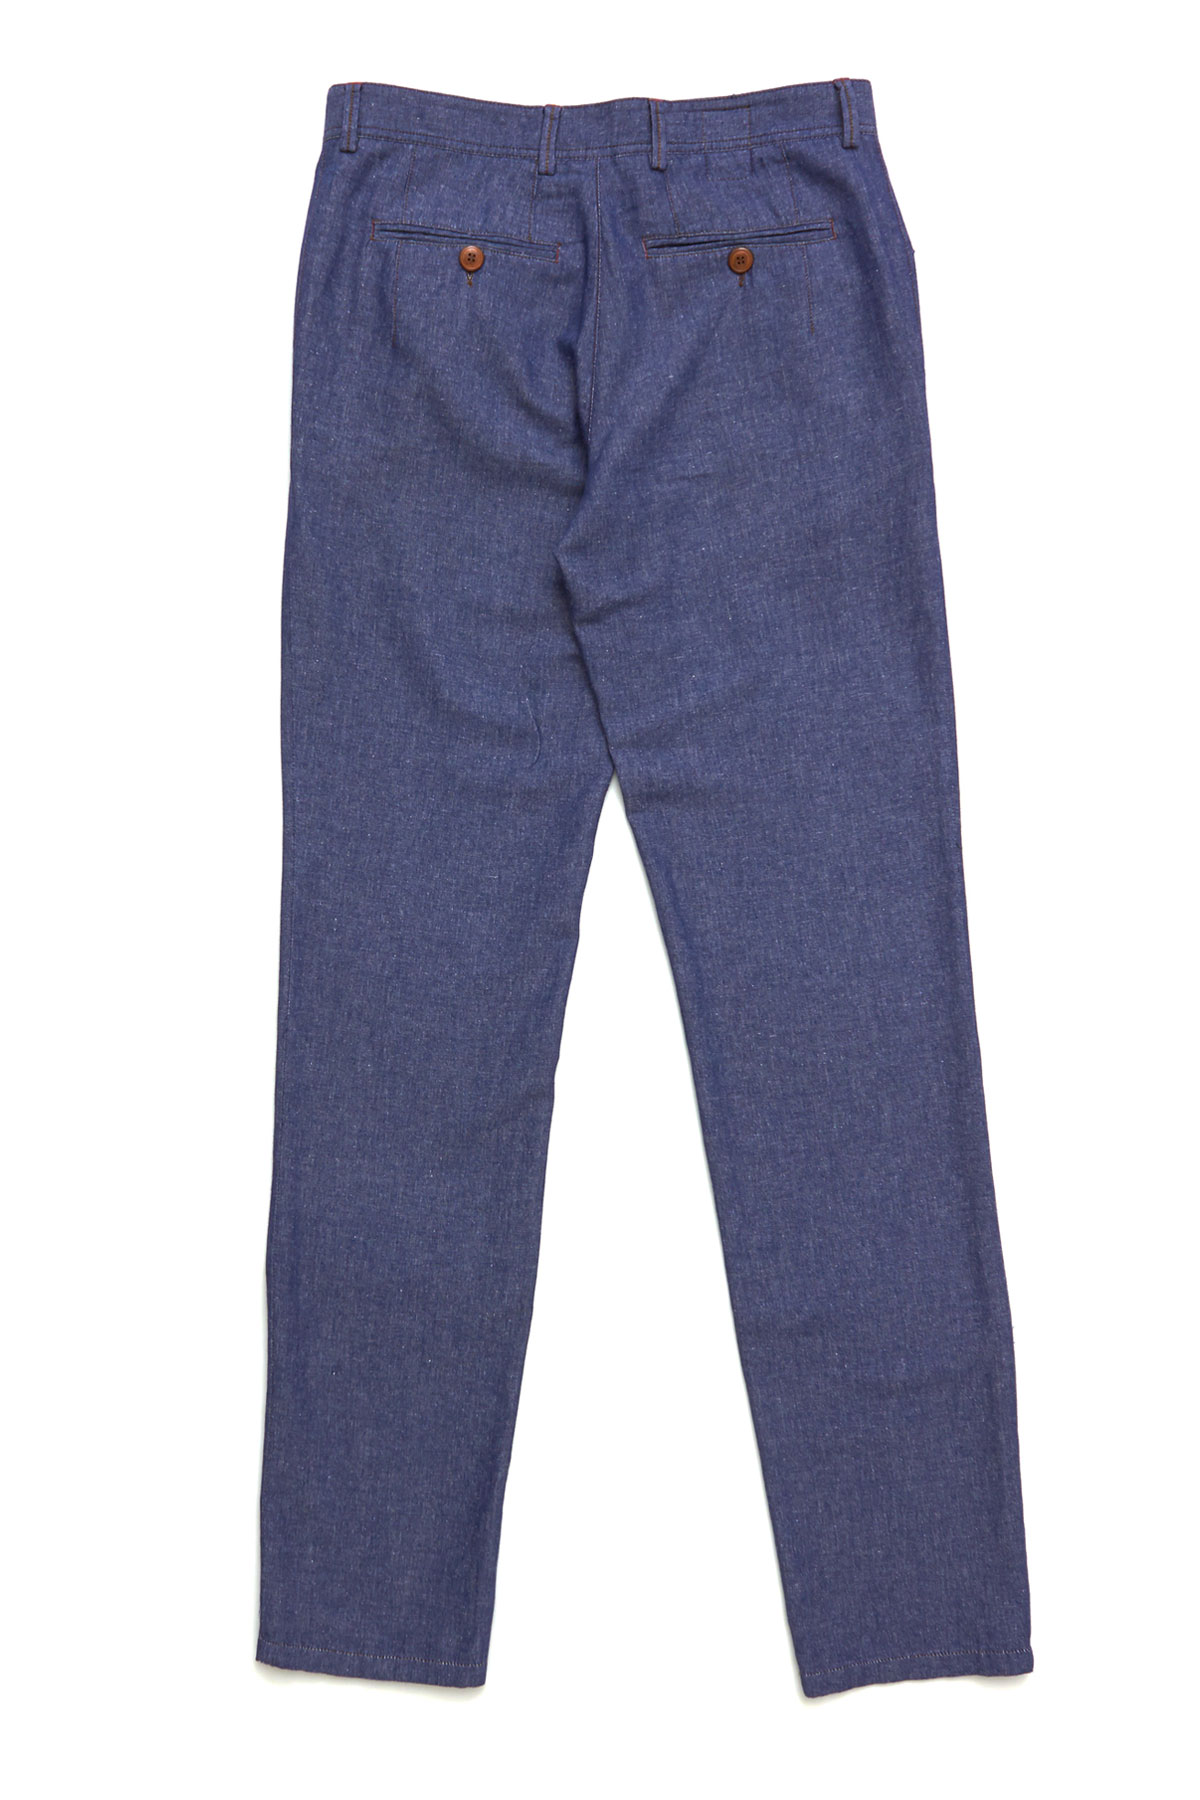 Брюки «chinos» синего цвета Vaismann 19724